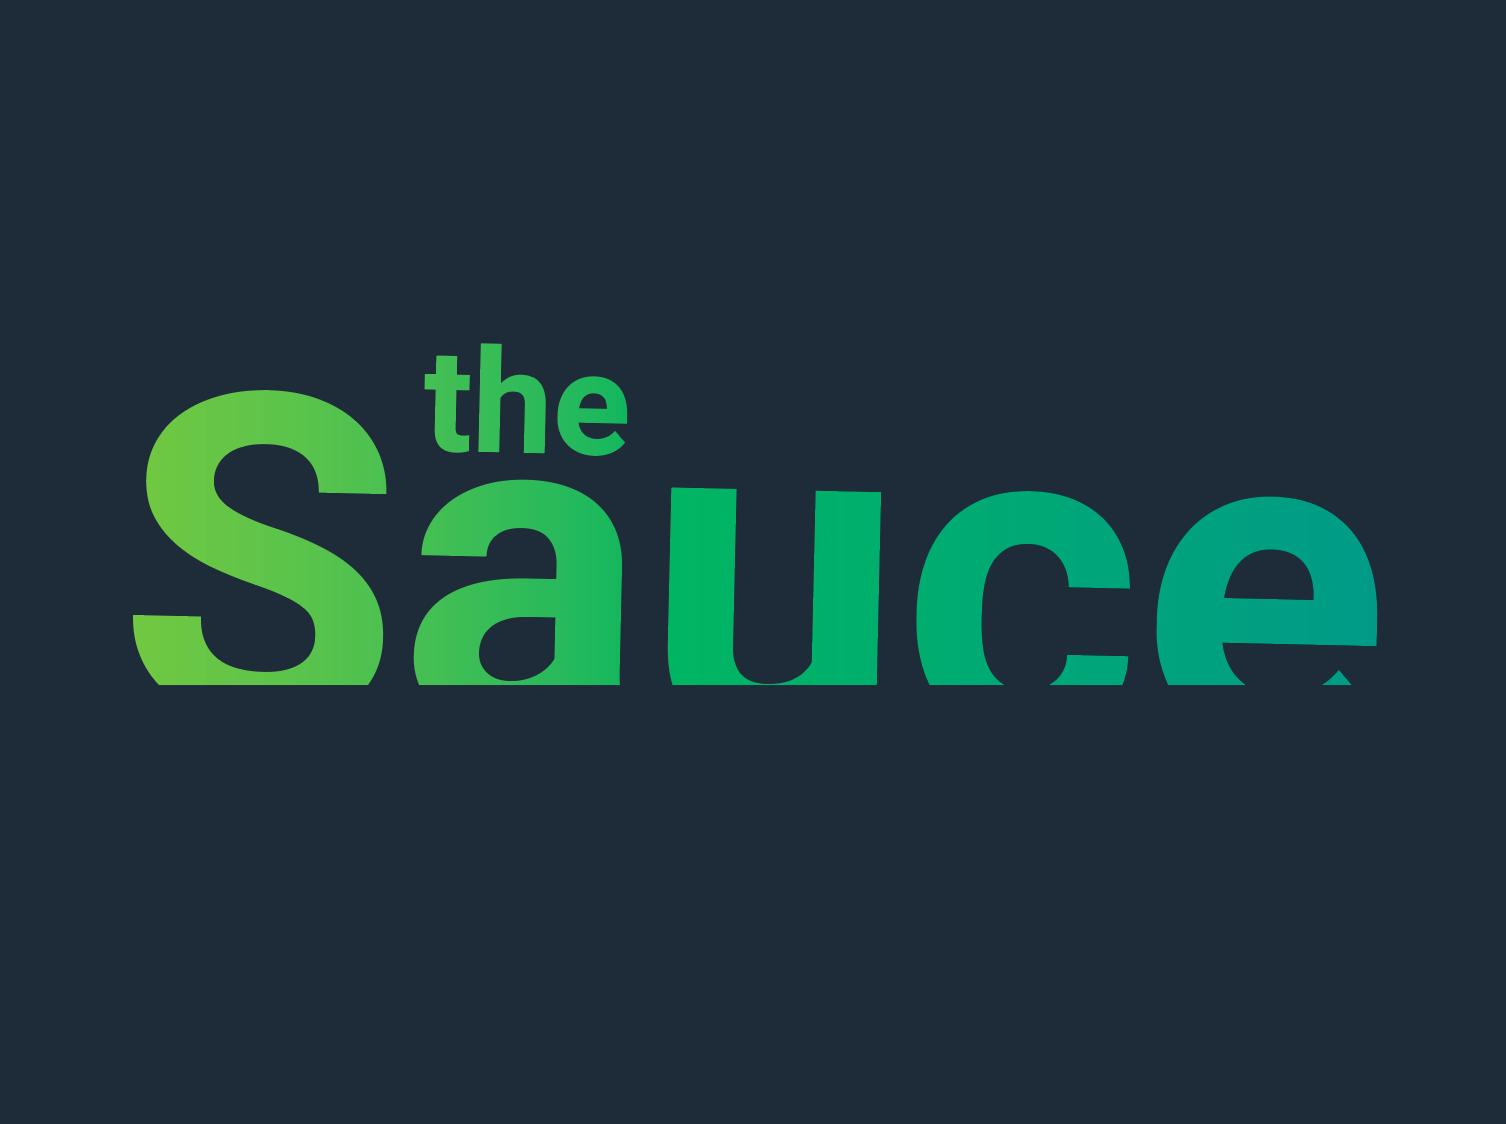 The Sauce logo